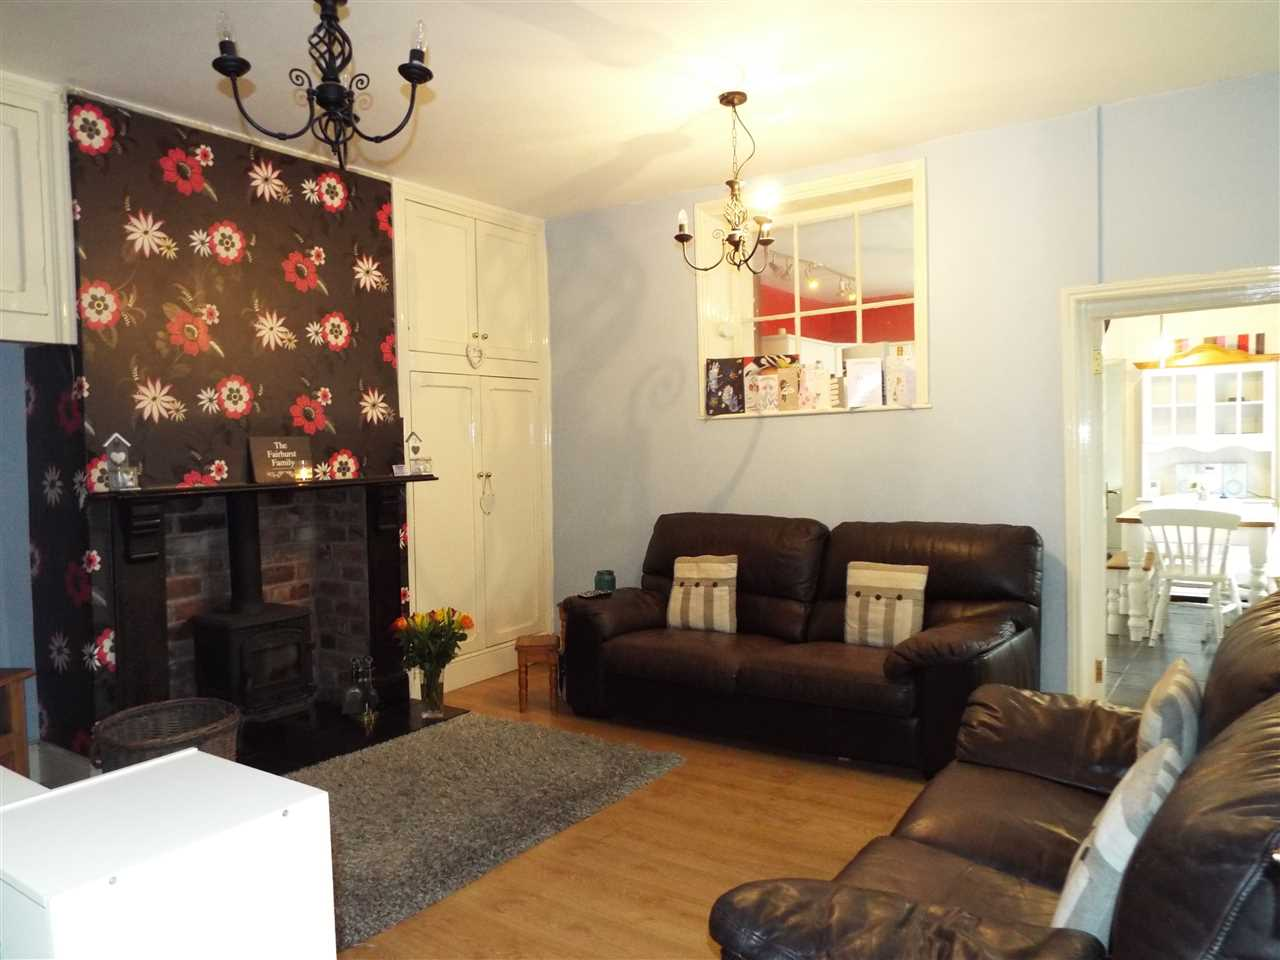 3 bed end-of-terrace for sale in Park Road, Adlington, Adlington 8